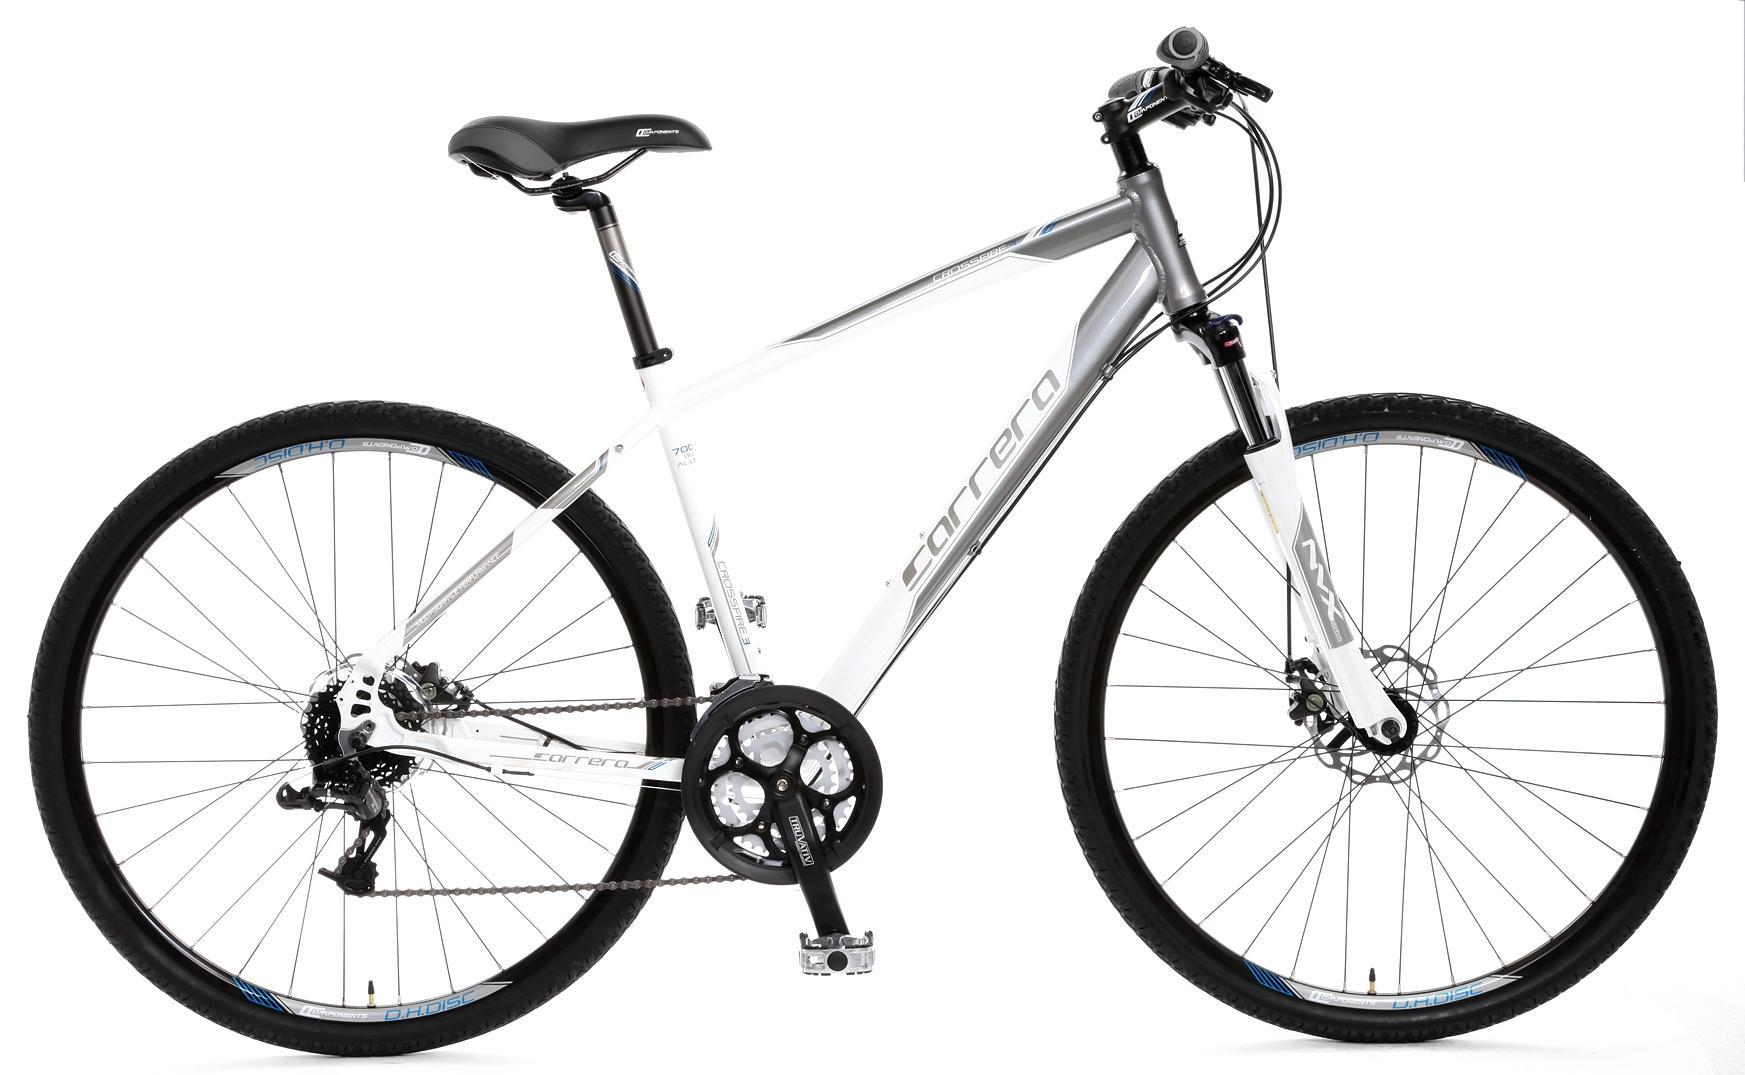 Details about Carrera Crossfire 3 Mens Hybrid Bike 17